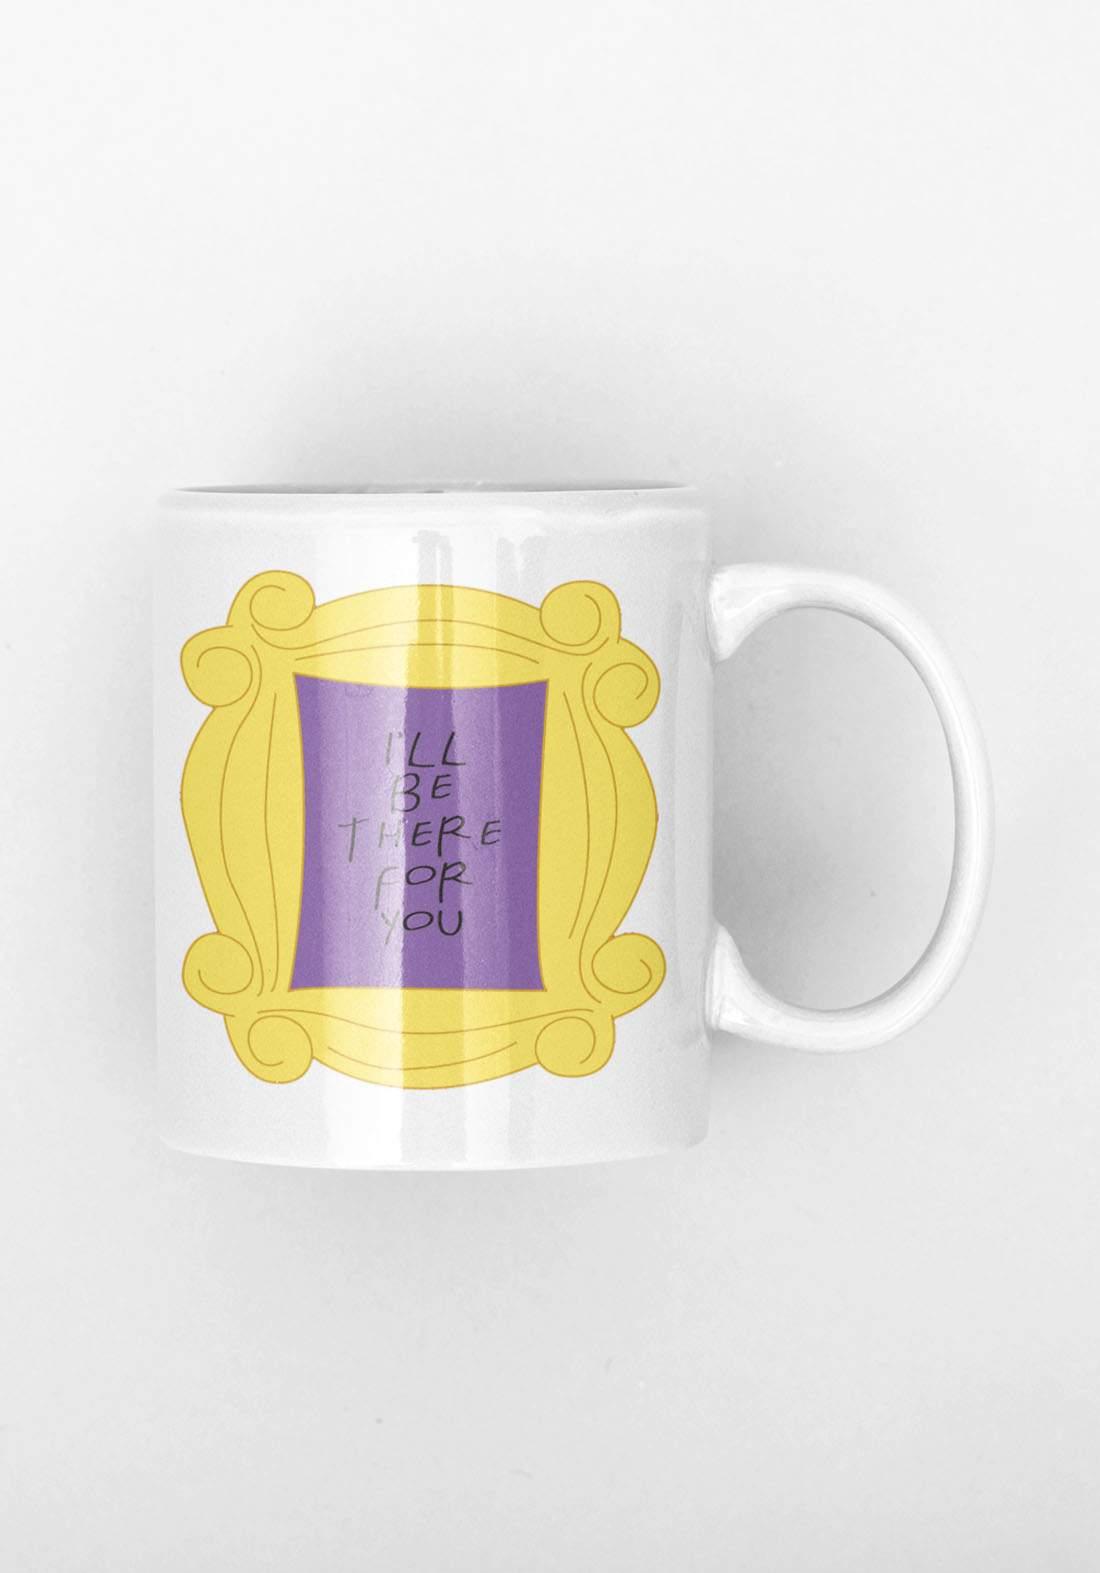 Friends TV Show Mug - كوب مسلسلة فريندز